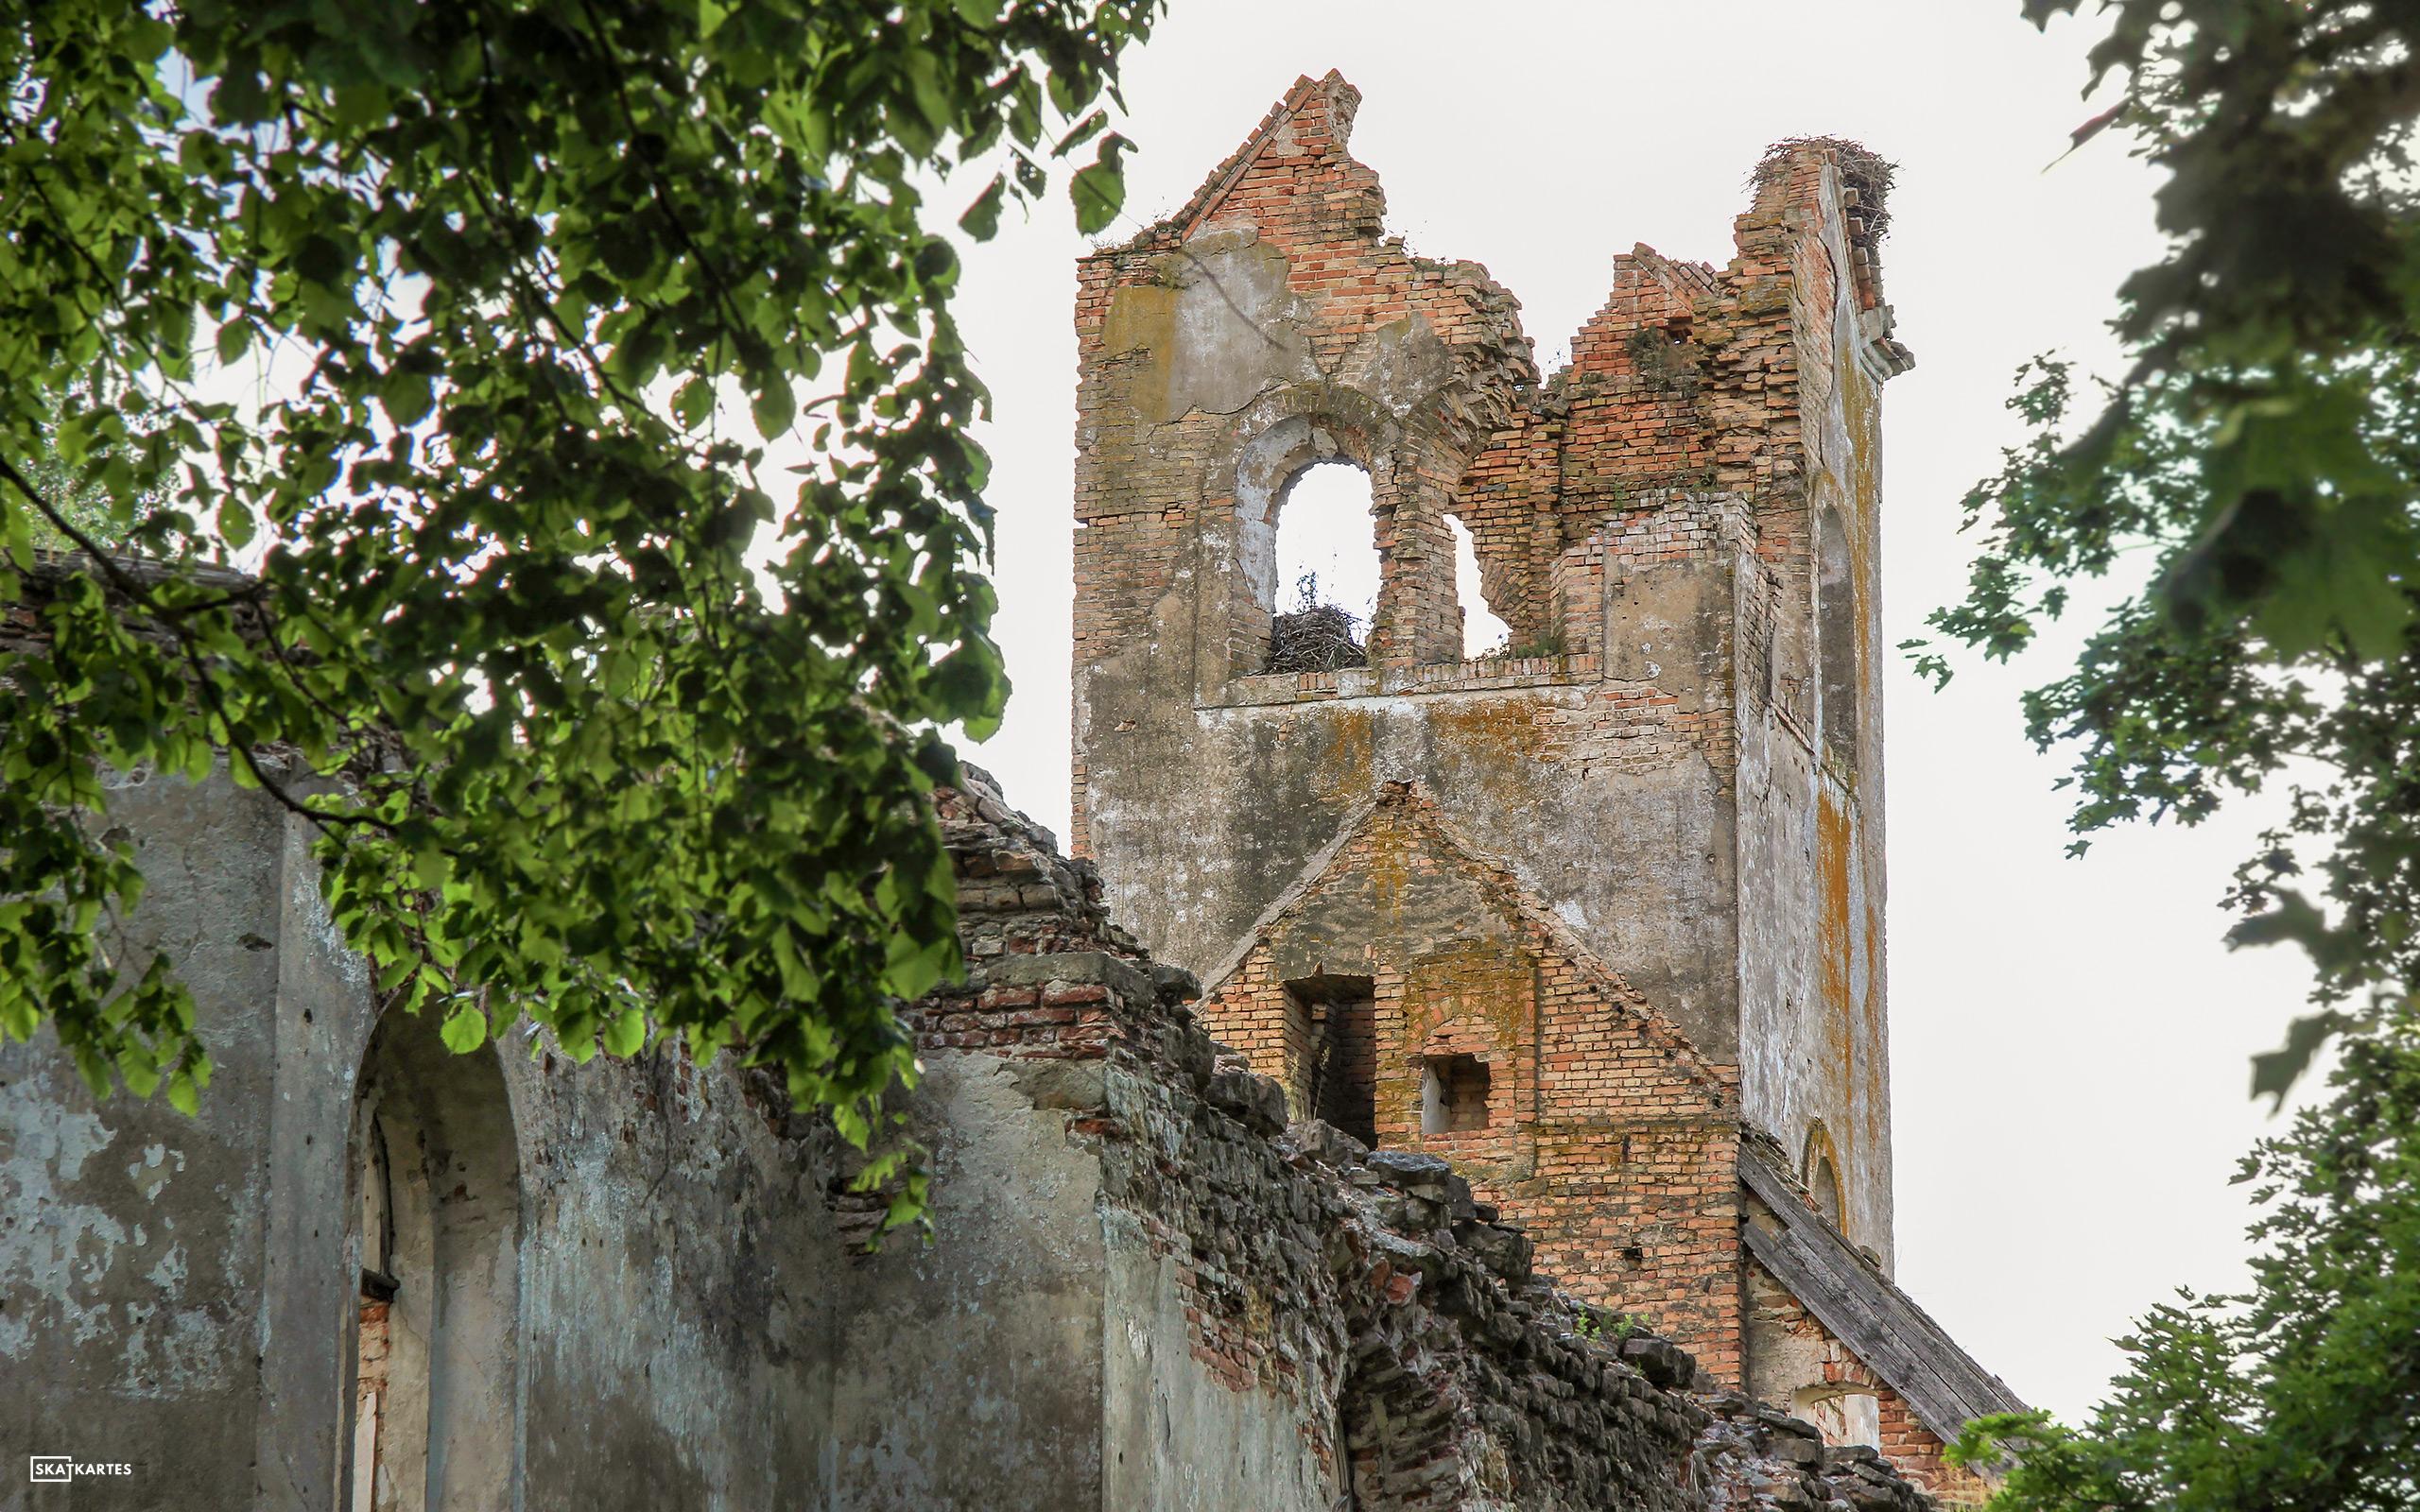 Skatkarte Nr. 1099 - Salgales baznīcas drupas (2015. gada vasara).